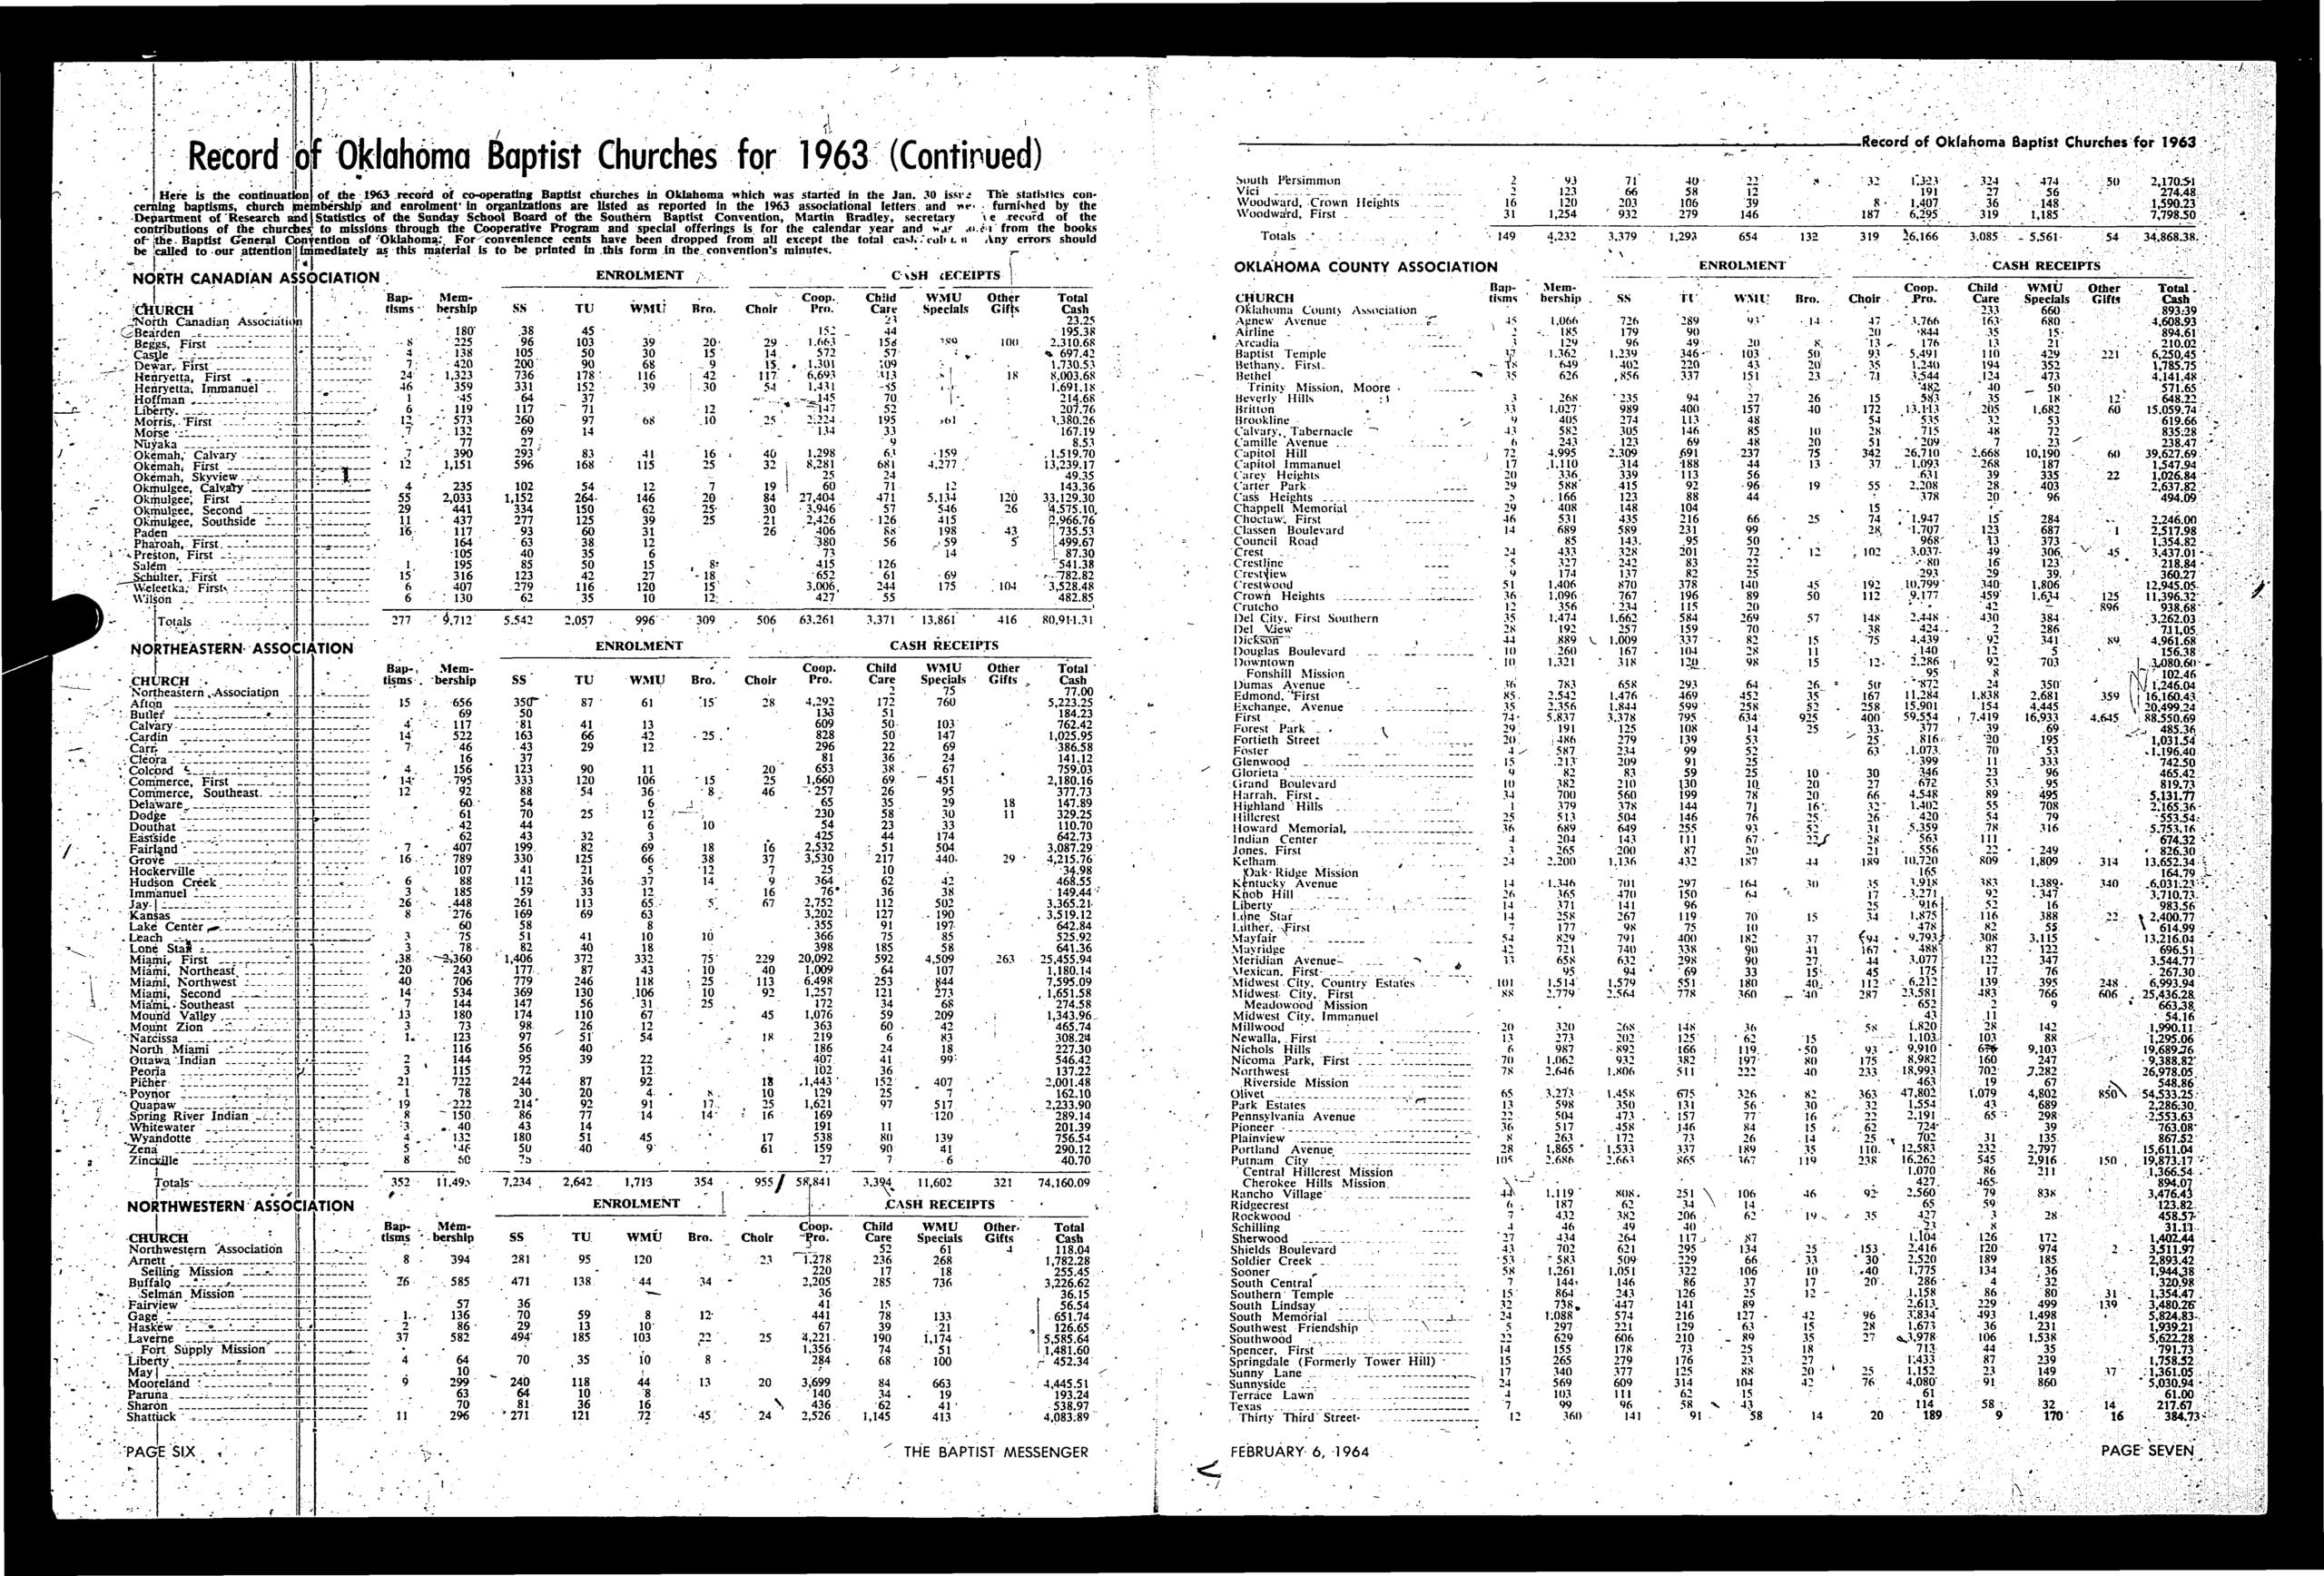 Record for Issr School Calendar